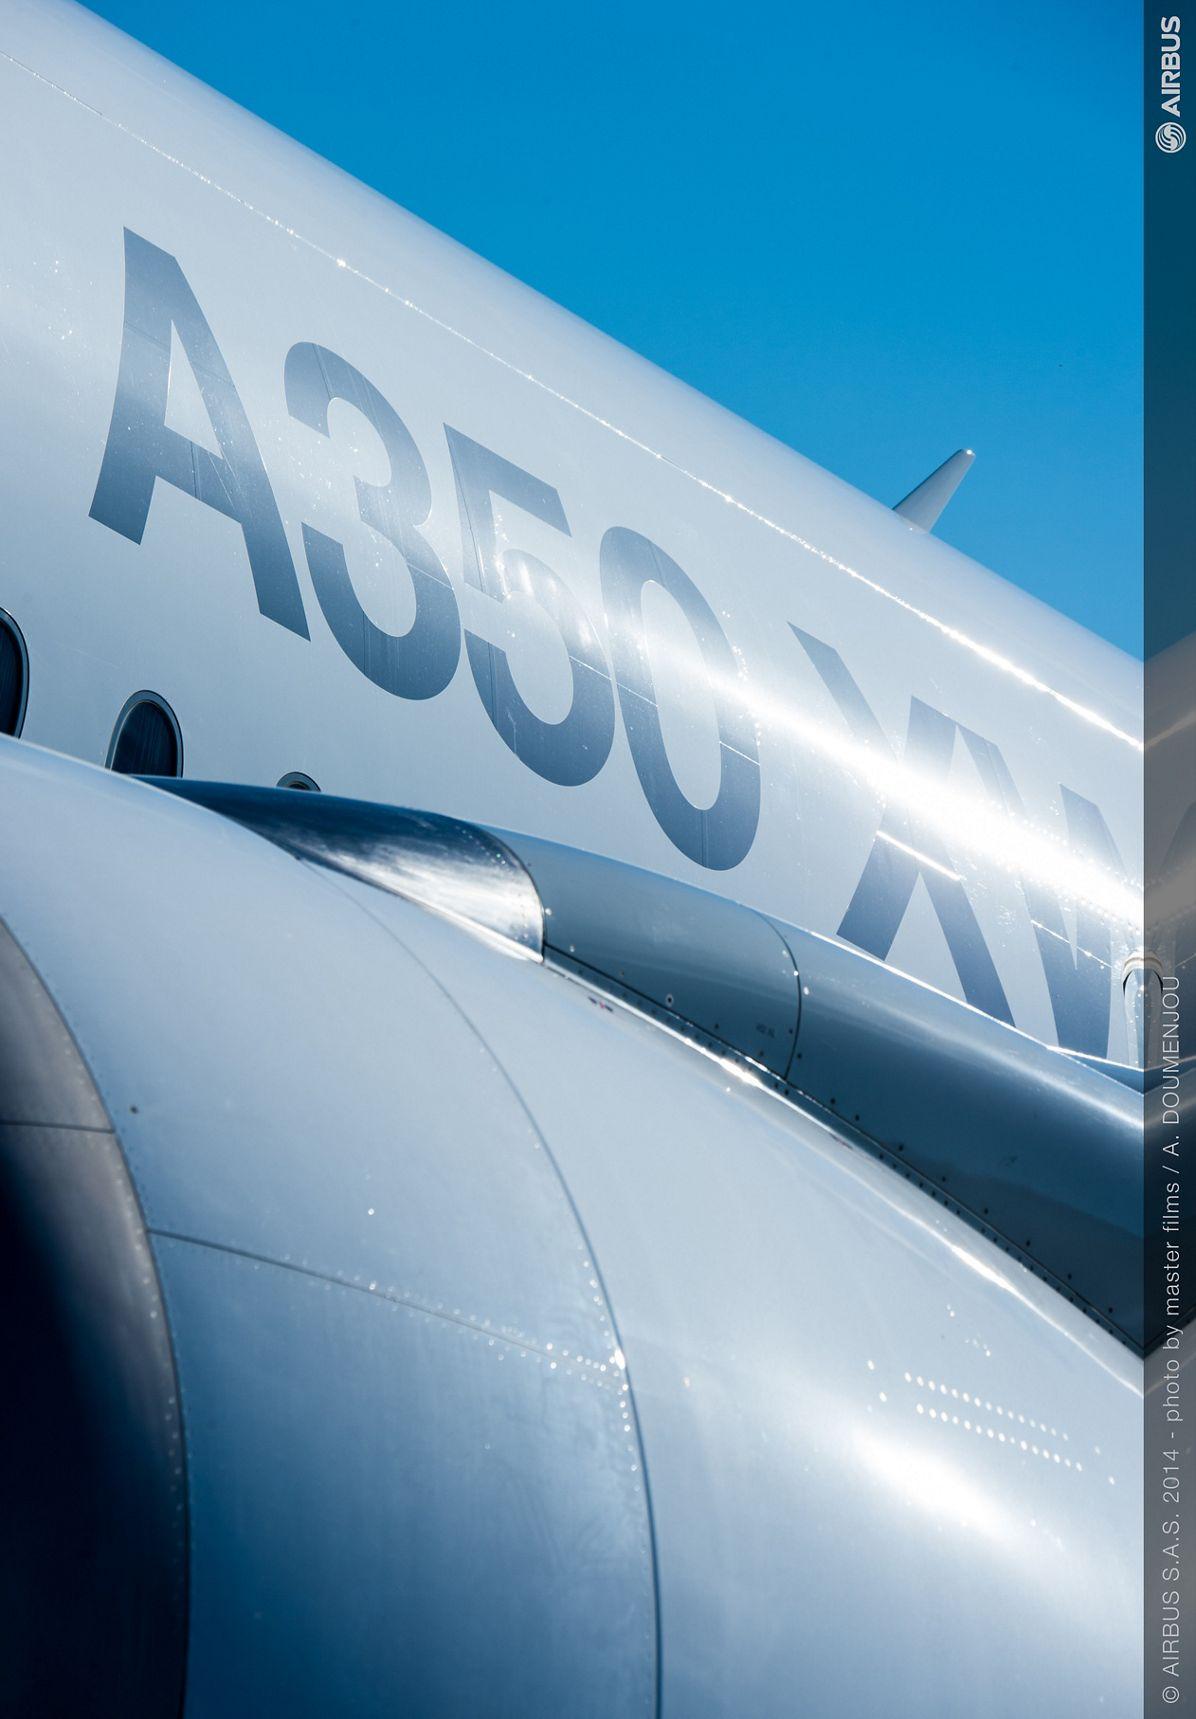 A350 XWB details-1